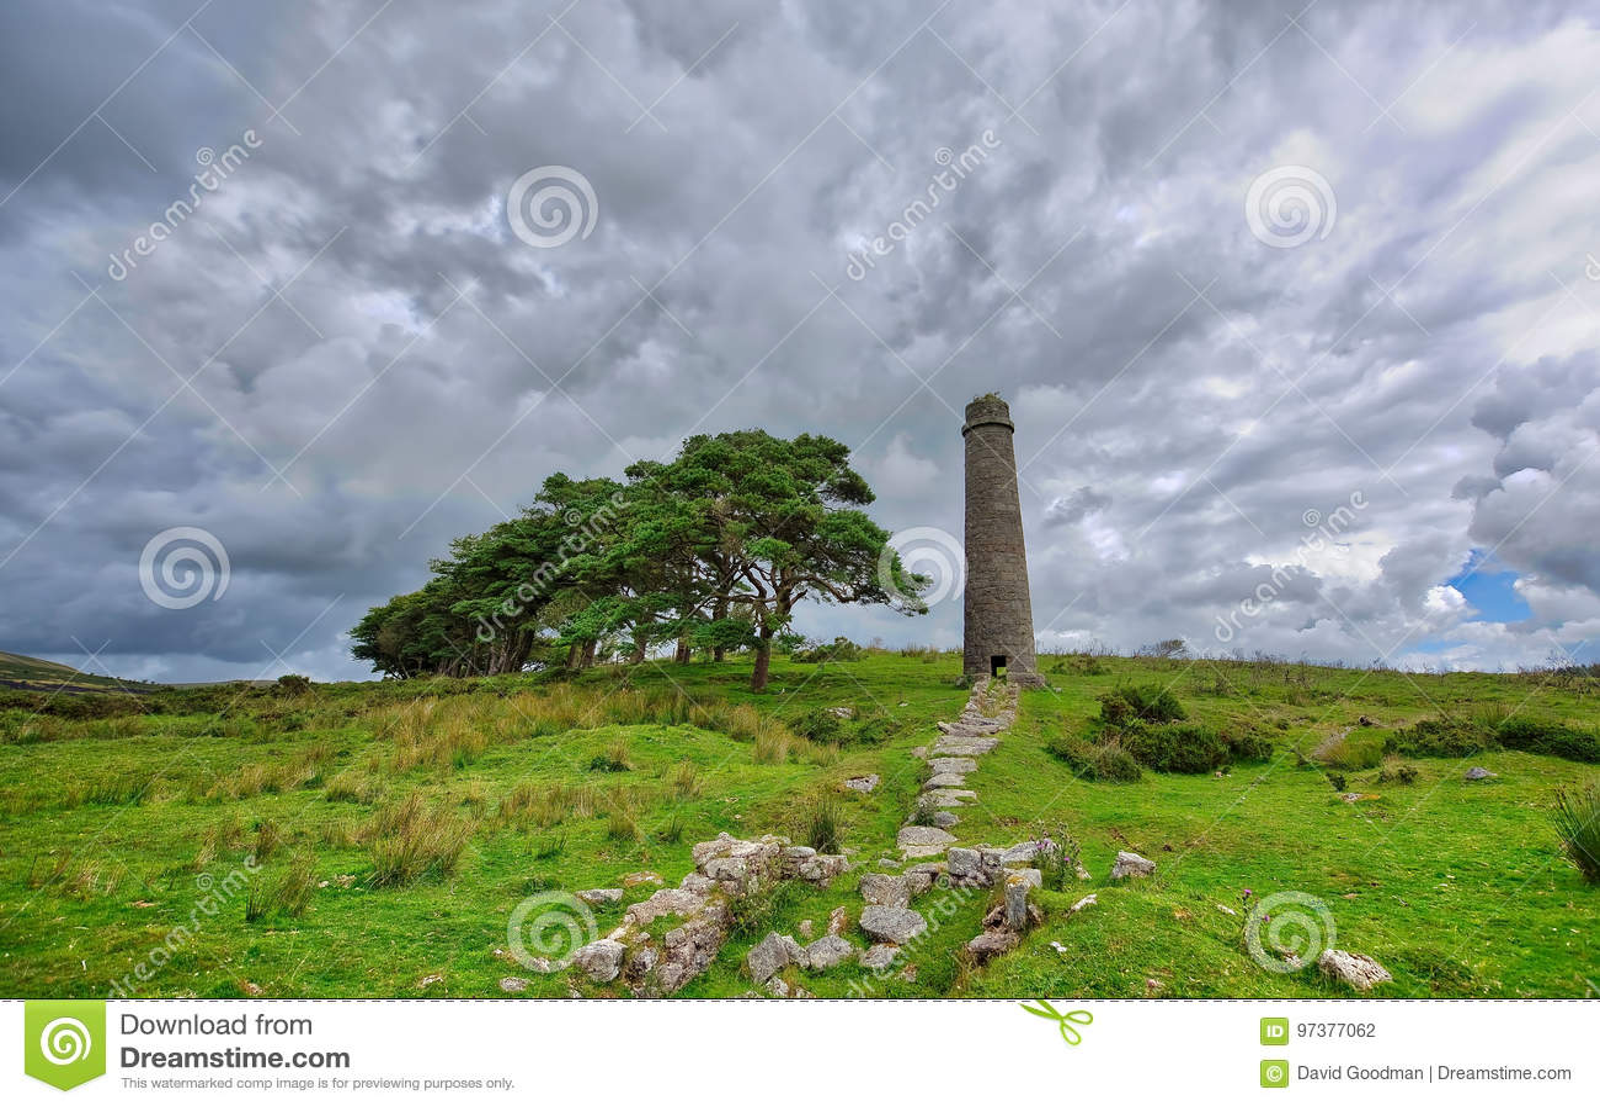 Oude Verlaten Graite Tin Mine bovenop Dartmoor in Engeland